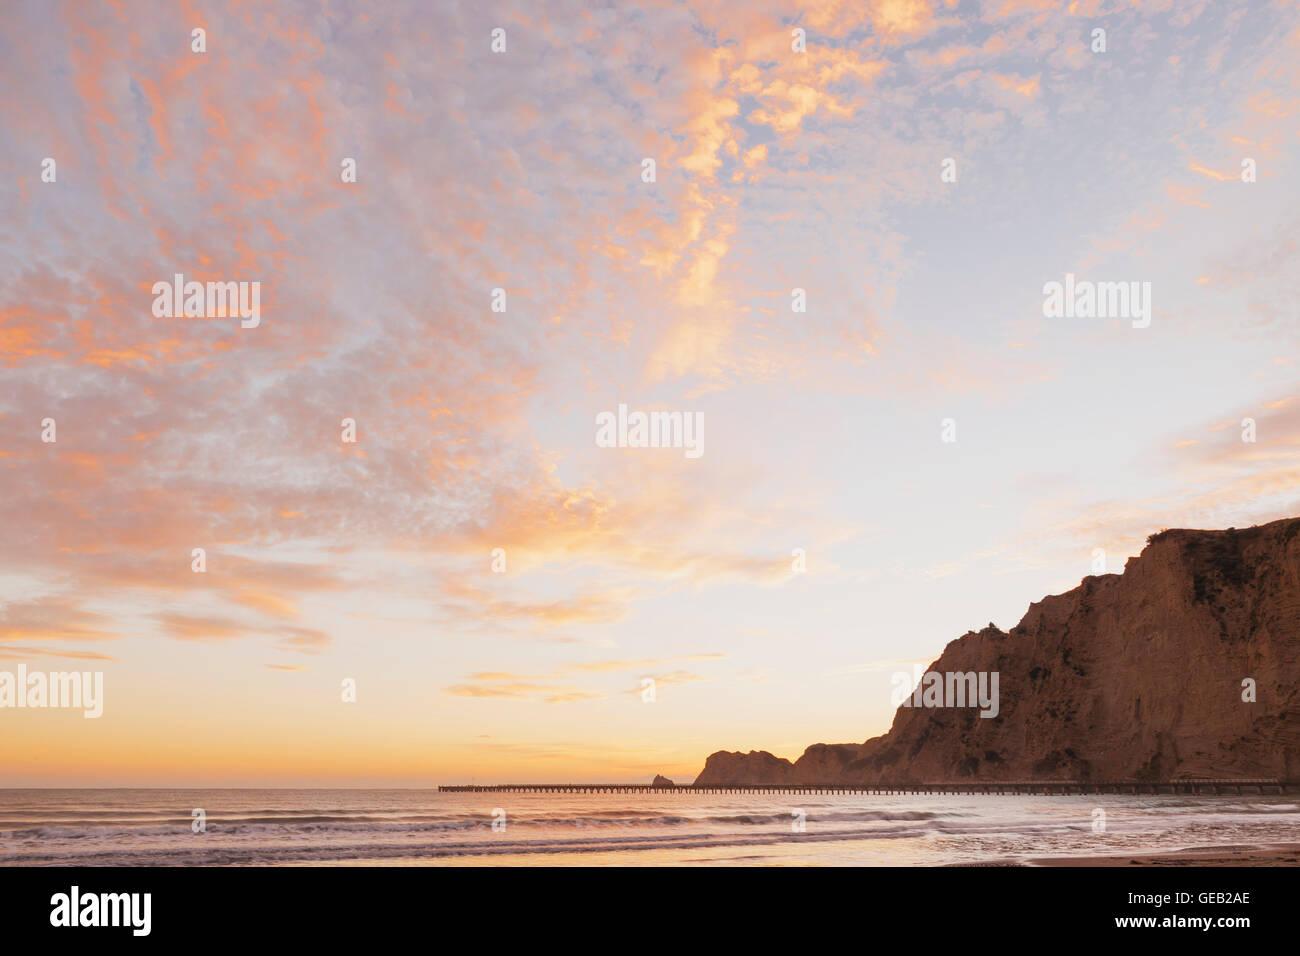 New Zealand, North Island, East Cape Region, Tolaga Bay, sunrise, historic Tologa Bay Wharf, South Pacific, area - Stock Image